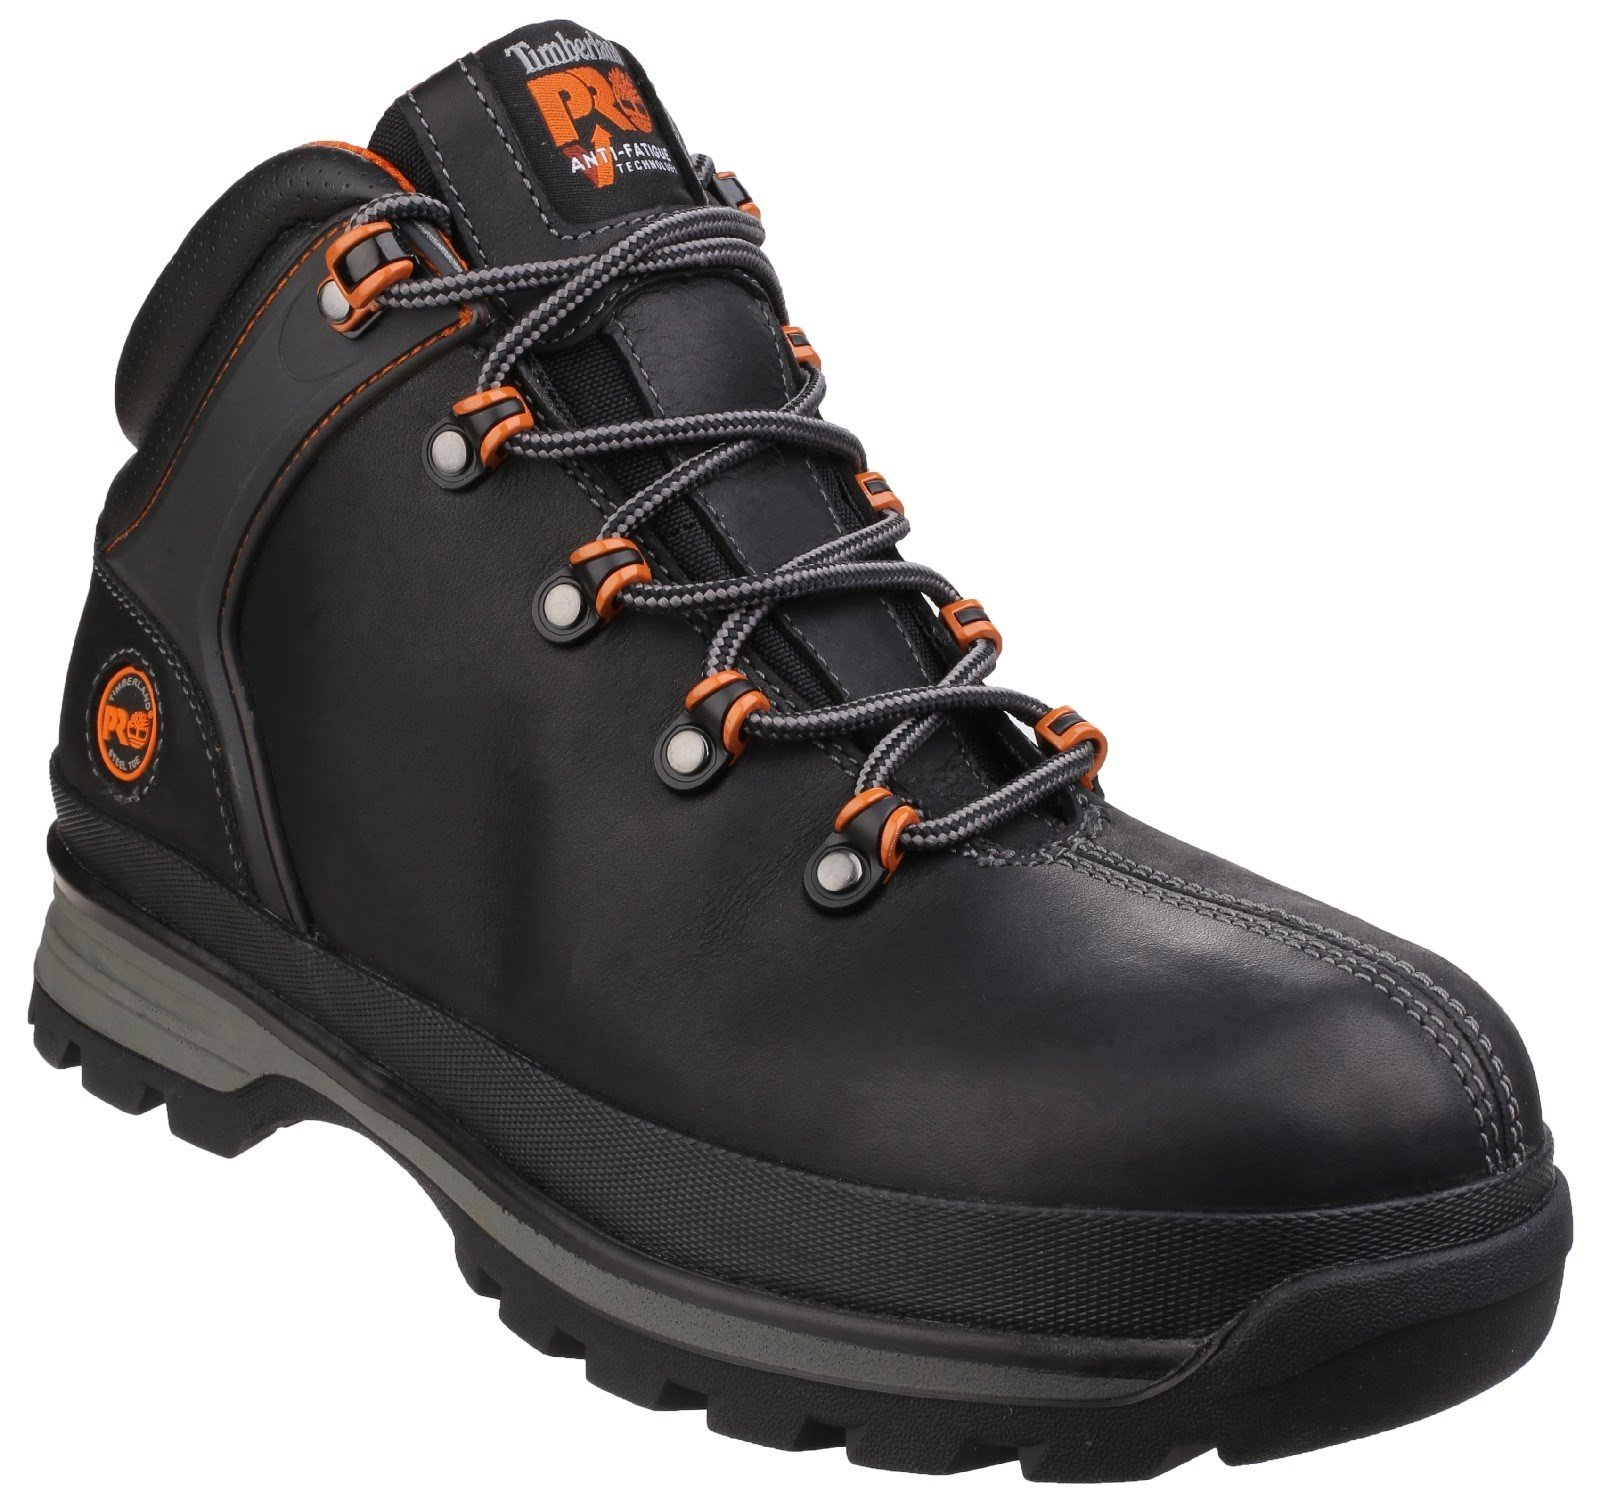 Timberland Pro Men's Splitrock XT Lace-up Safety Boot Various Colours 25948 - Black 4